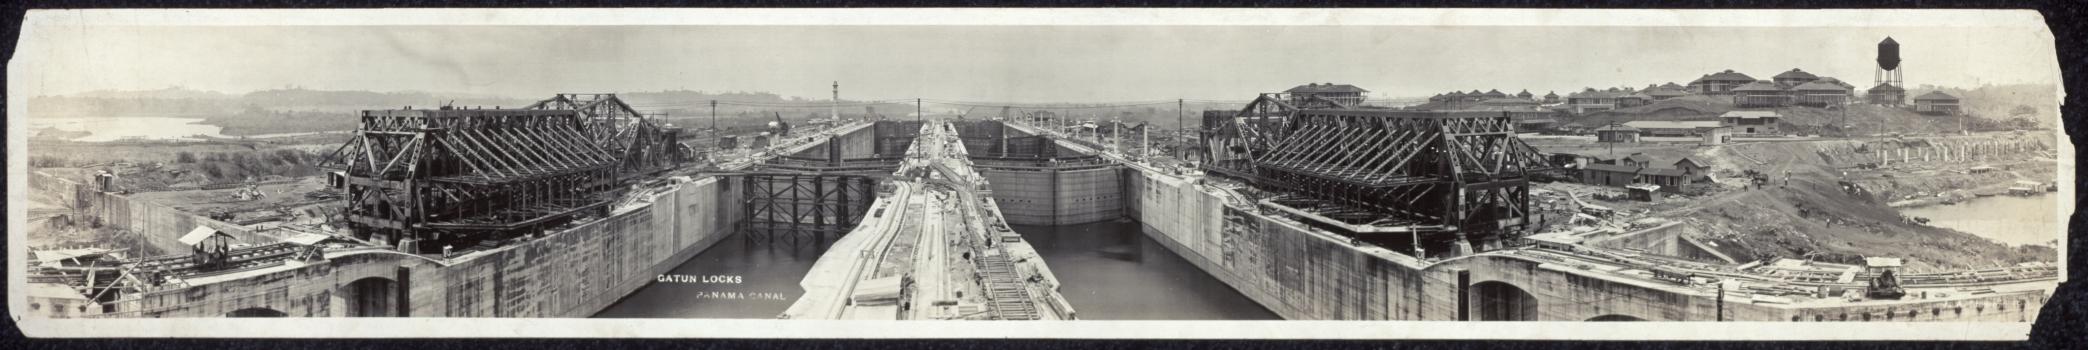 Panama Canal - Gatún locks under construction